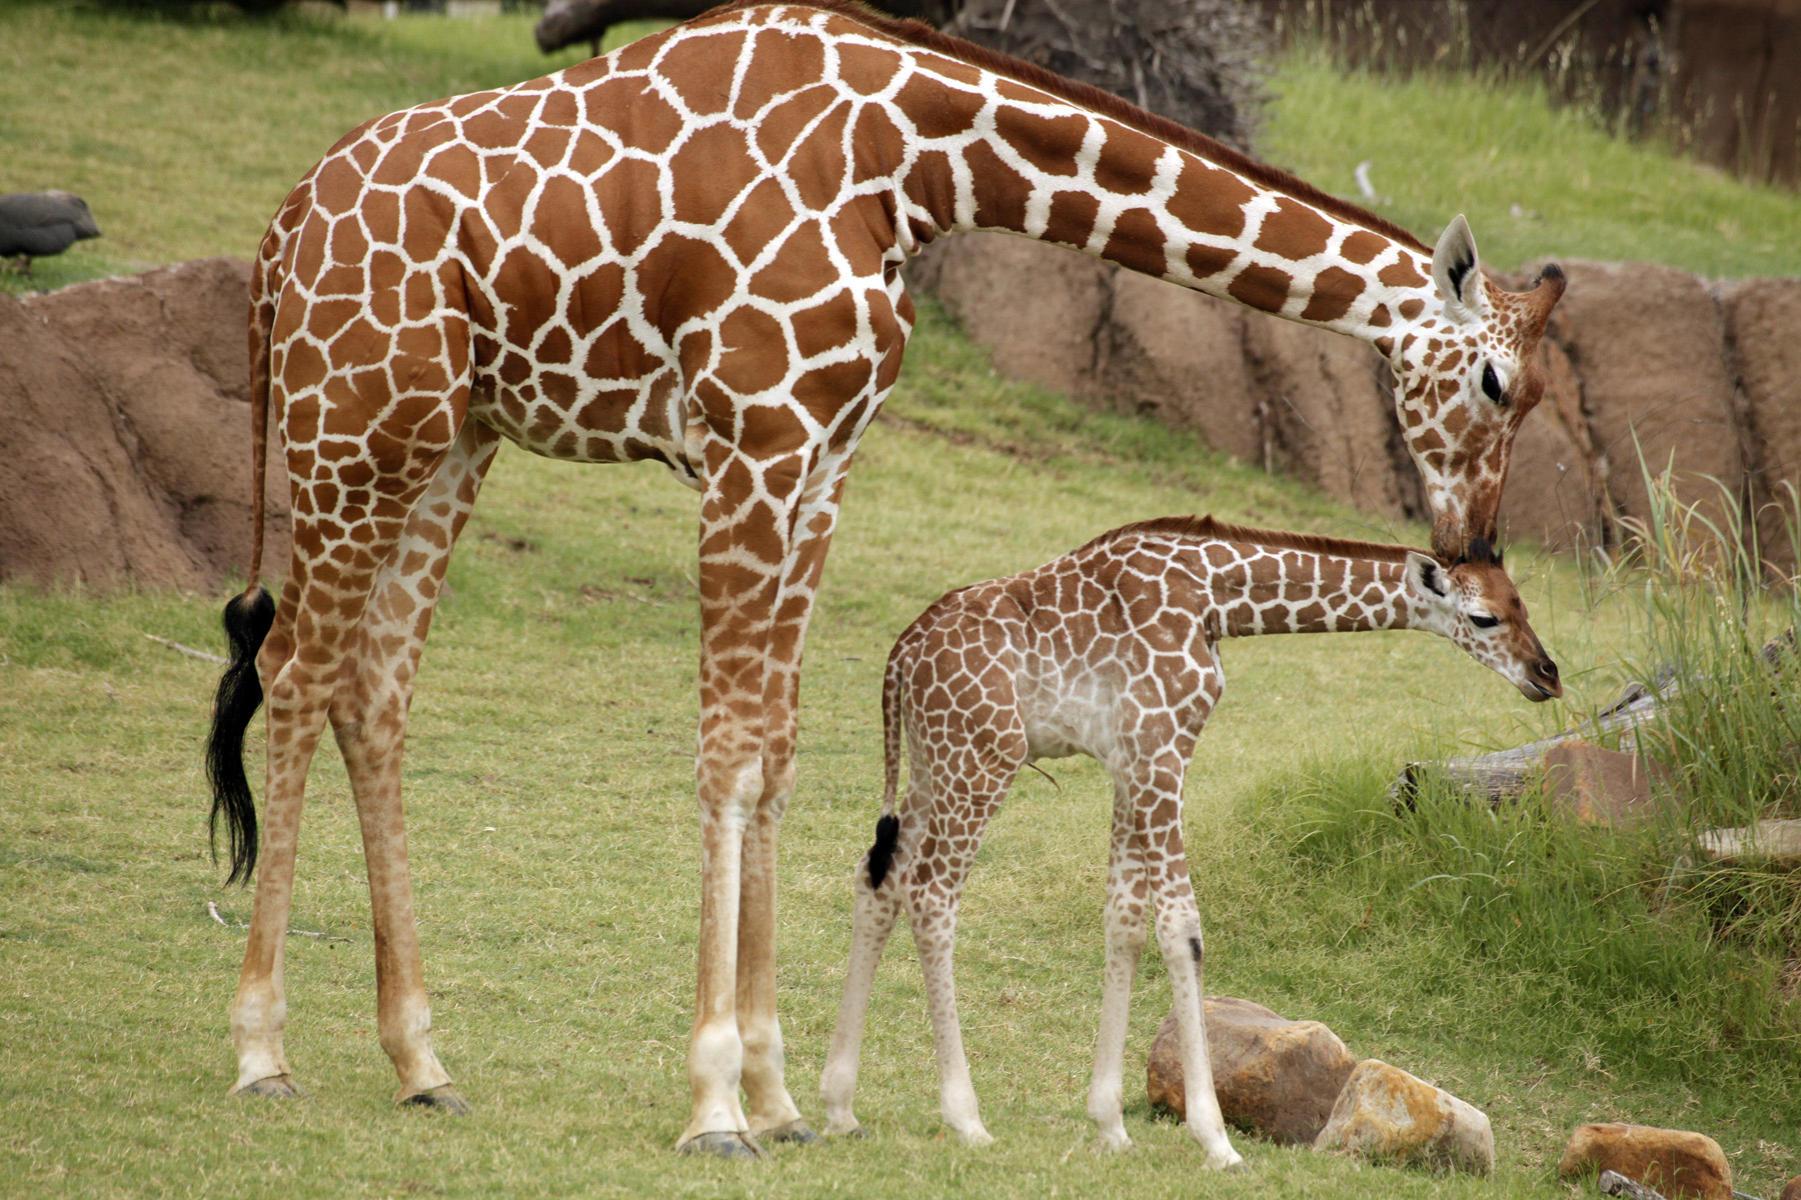 Giraffe Photos | Giraffe Birth Live | Animal Planet